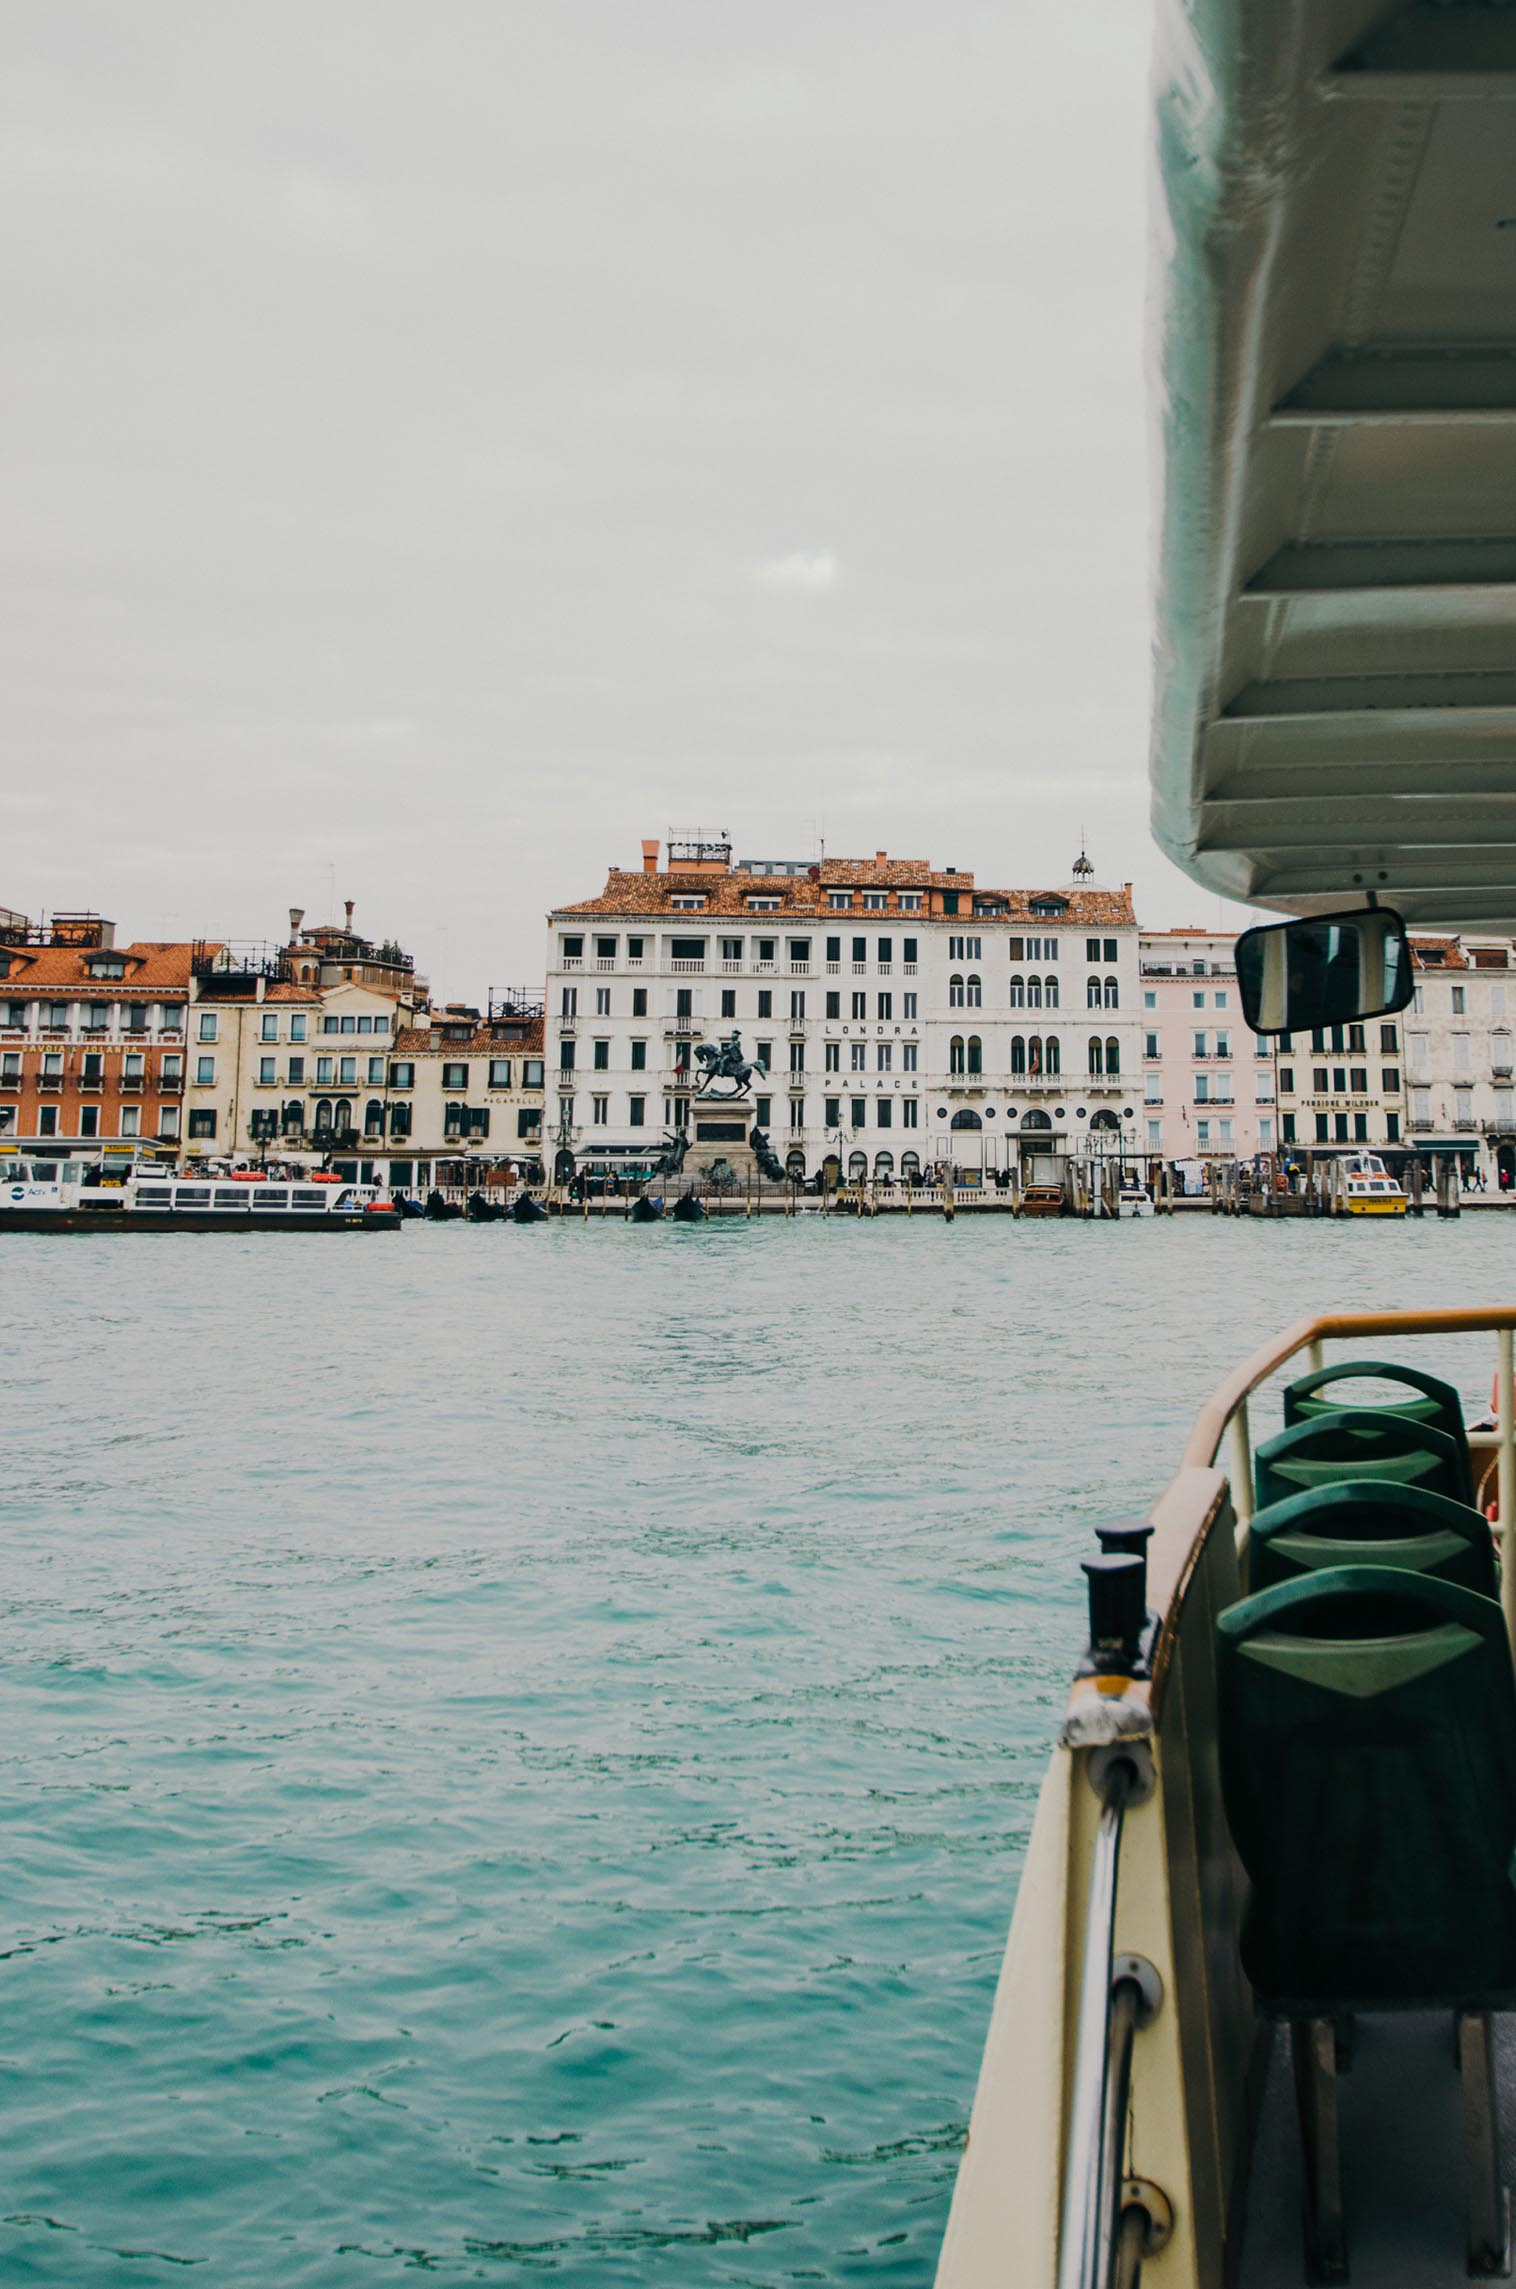 AdamSzafranski-Venice-Italy-02.jpg